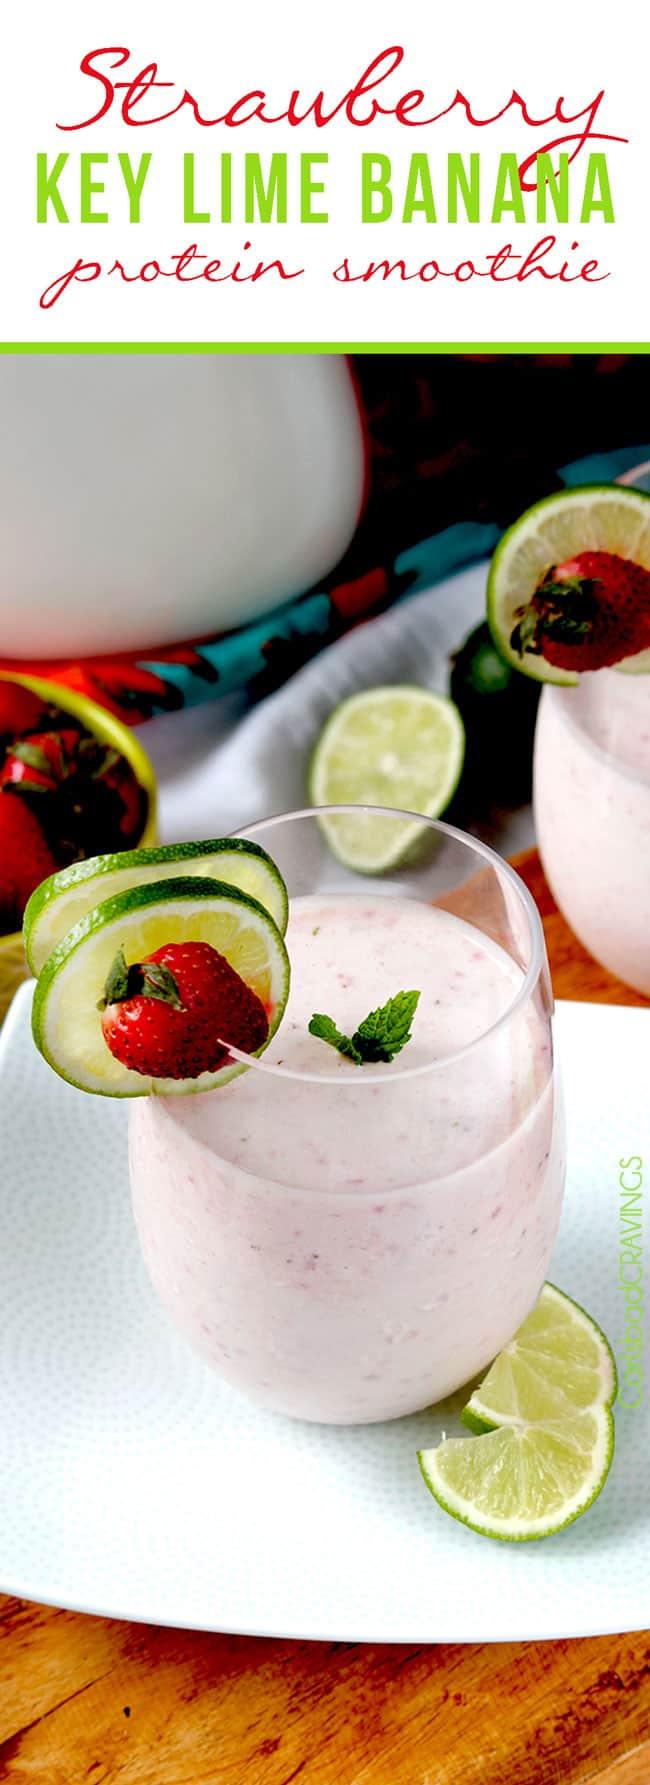 Key-Lime-Strawberry-Banana-Smoothie-main2